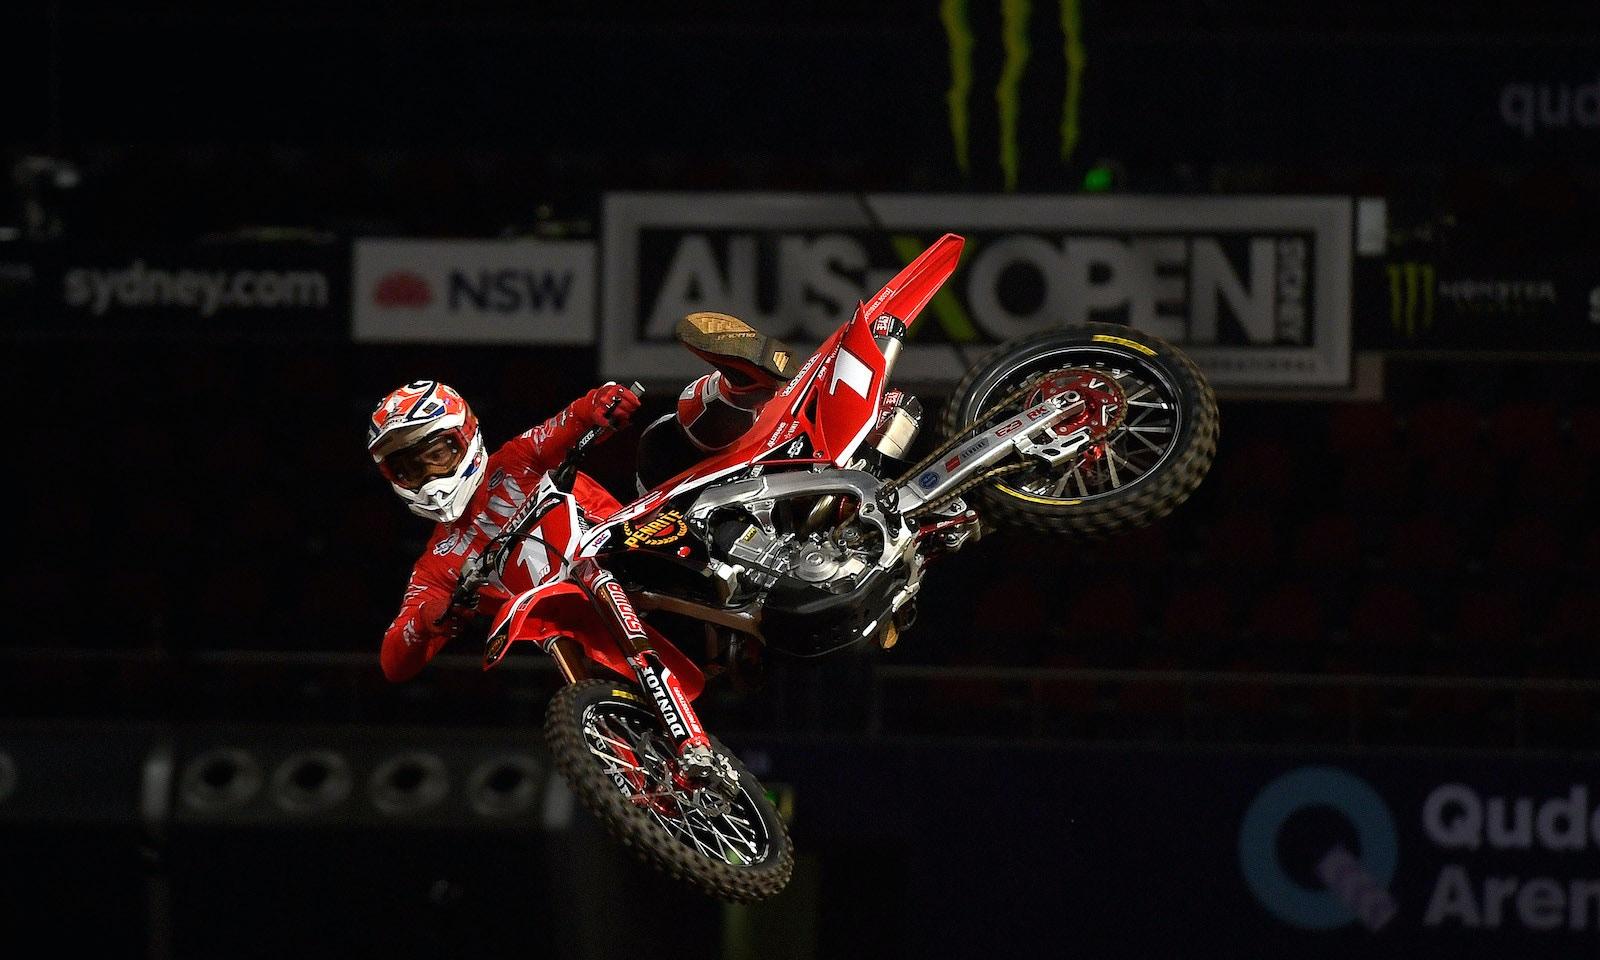 2018 Australian Supercross Championships - Round 3, Geelong